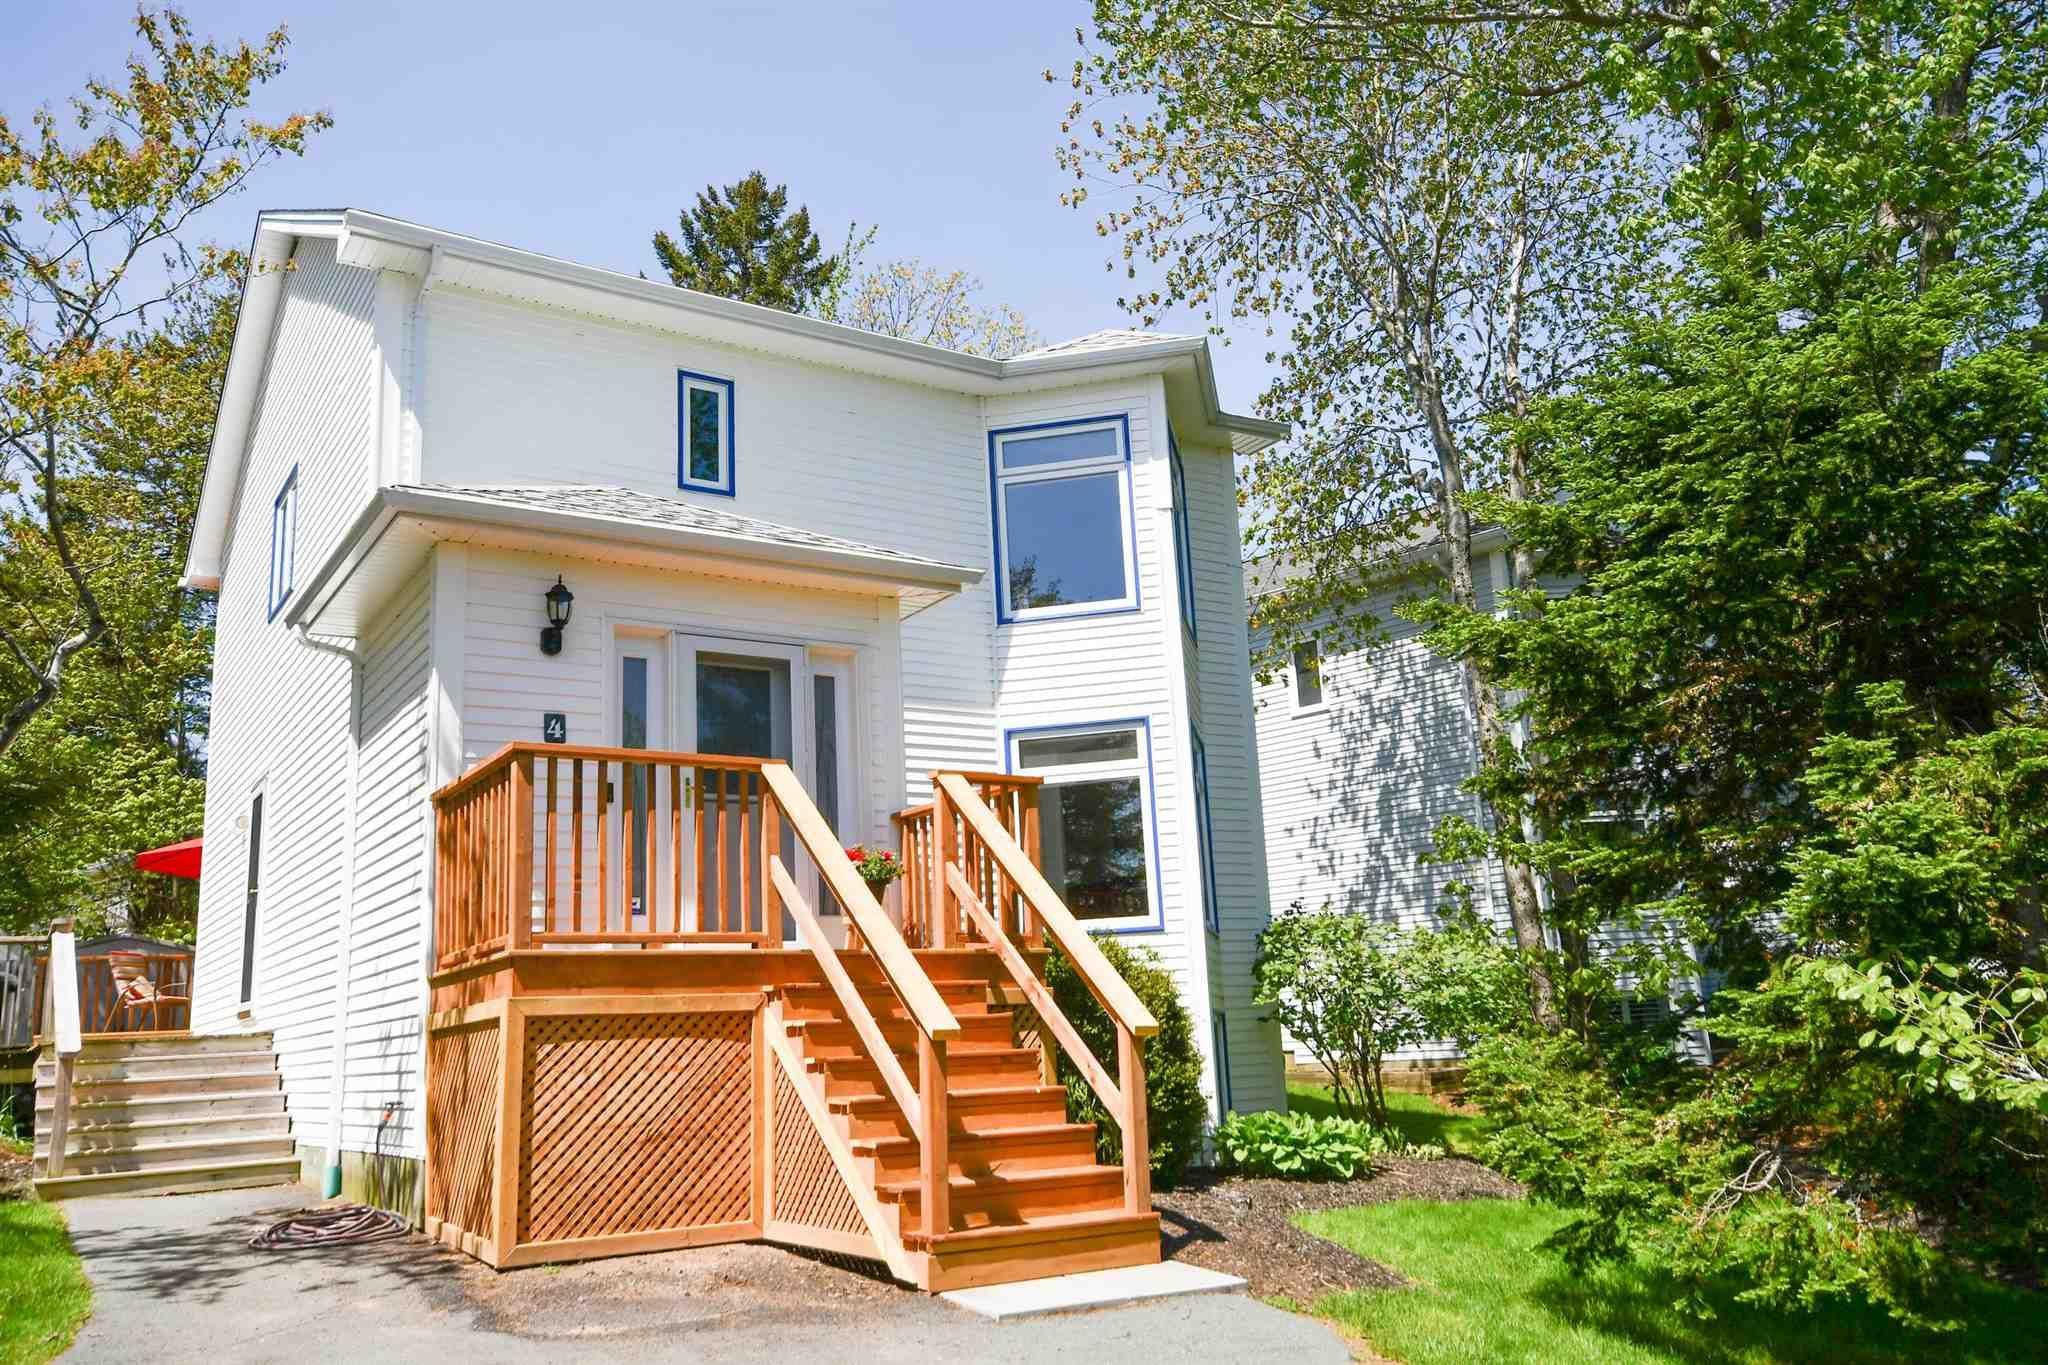 Main Photo: 4 Kilbirnie Lane in Halifax: 5-Fairmount, Clayton Park, Rockingham Residential for sale (Halifax-Dartmouth)  : MLS®# 202112900